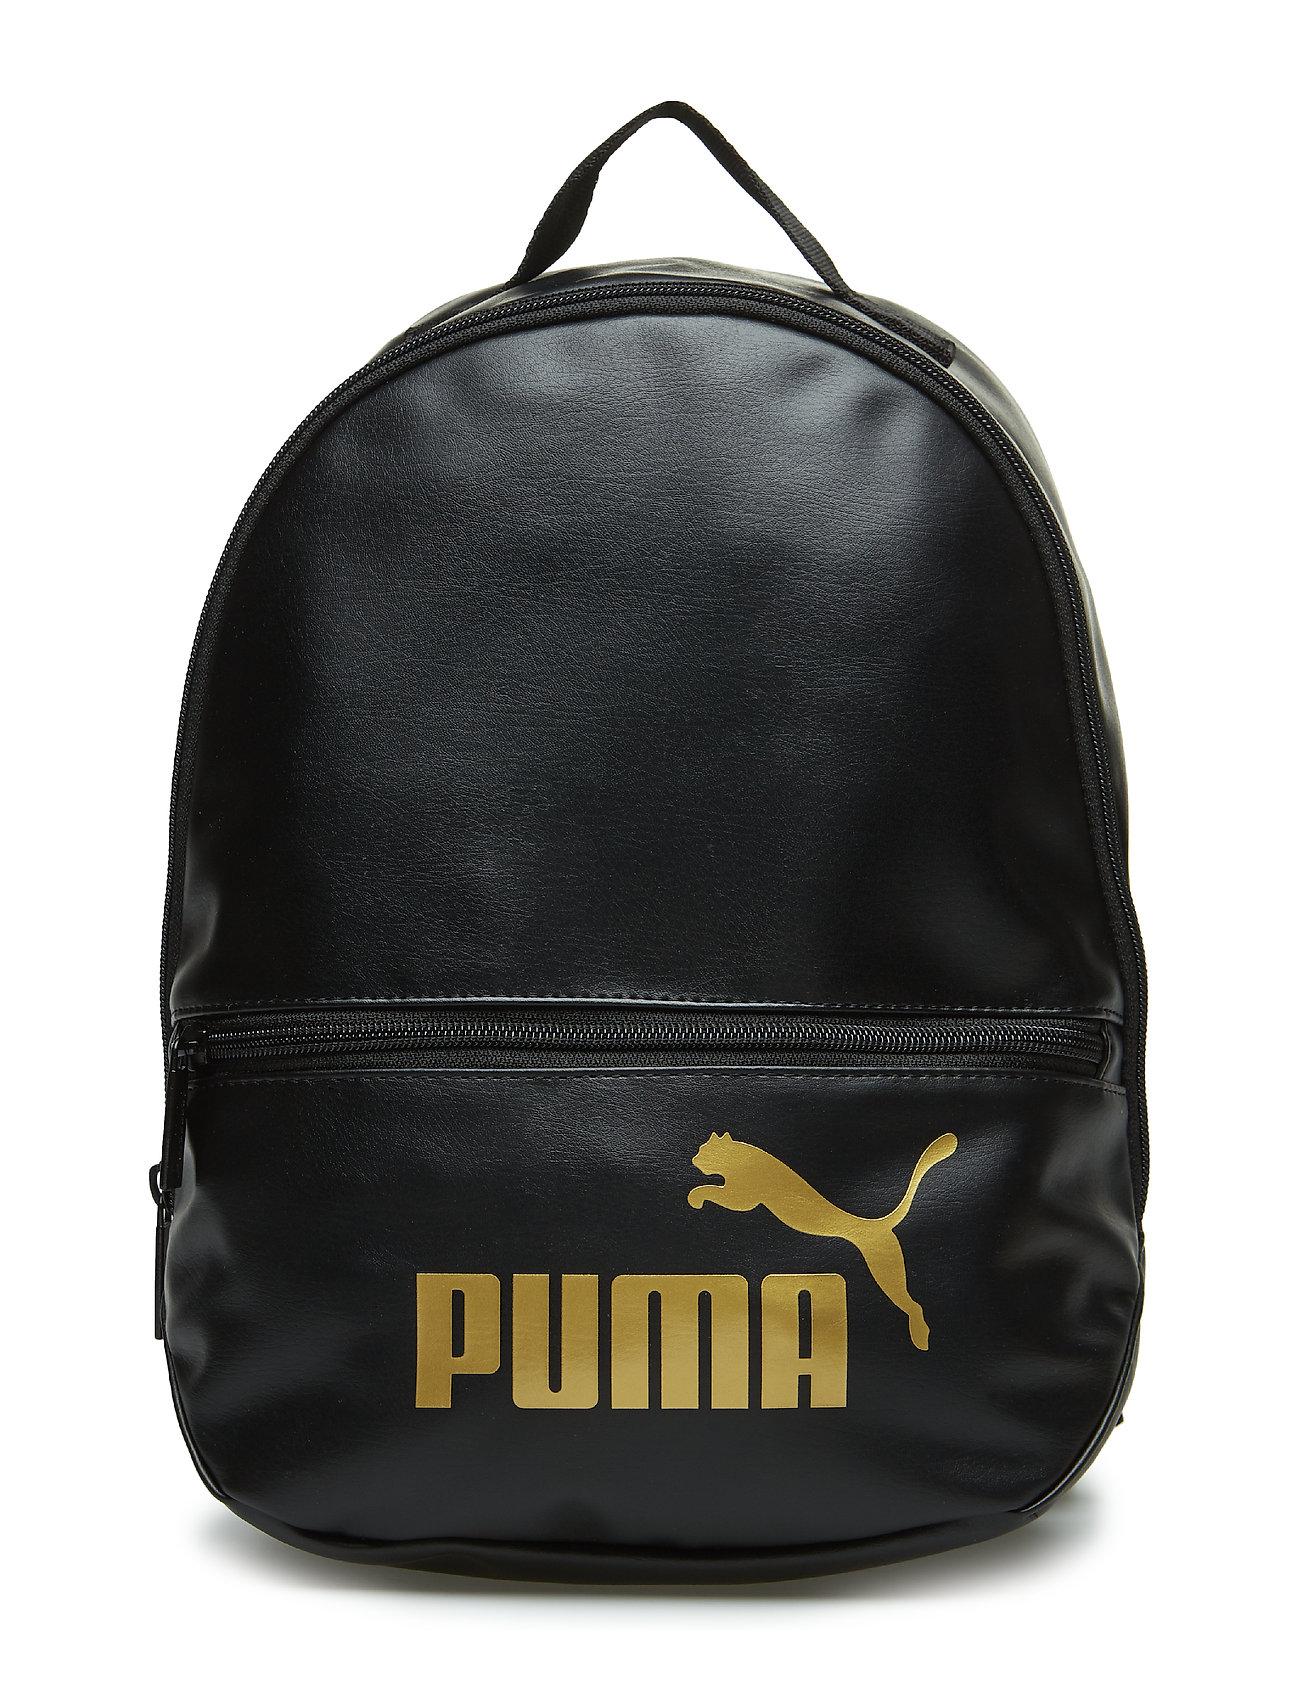 Wmn Core Up Archive Backpack (Puma Black) (£27.20) - PUMA -  8a3a7b2d4542f